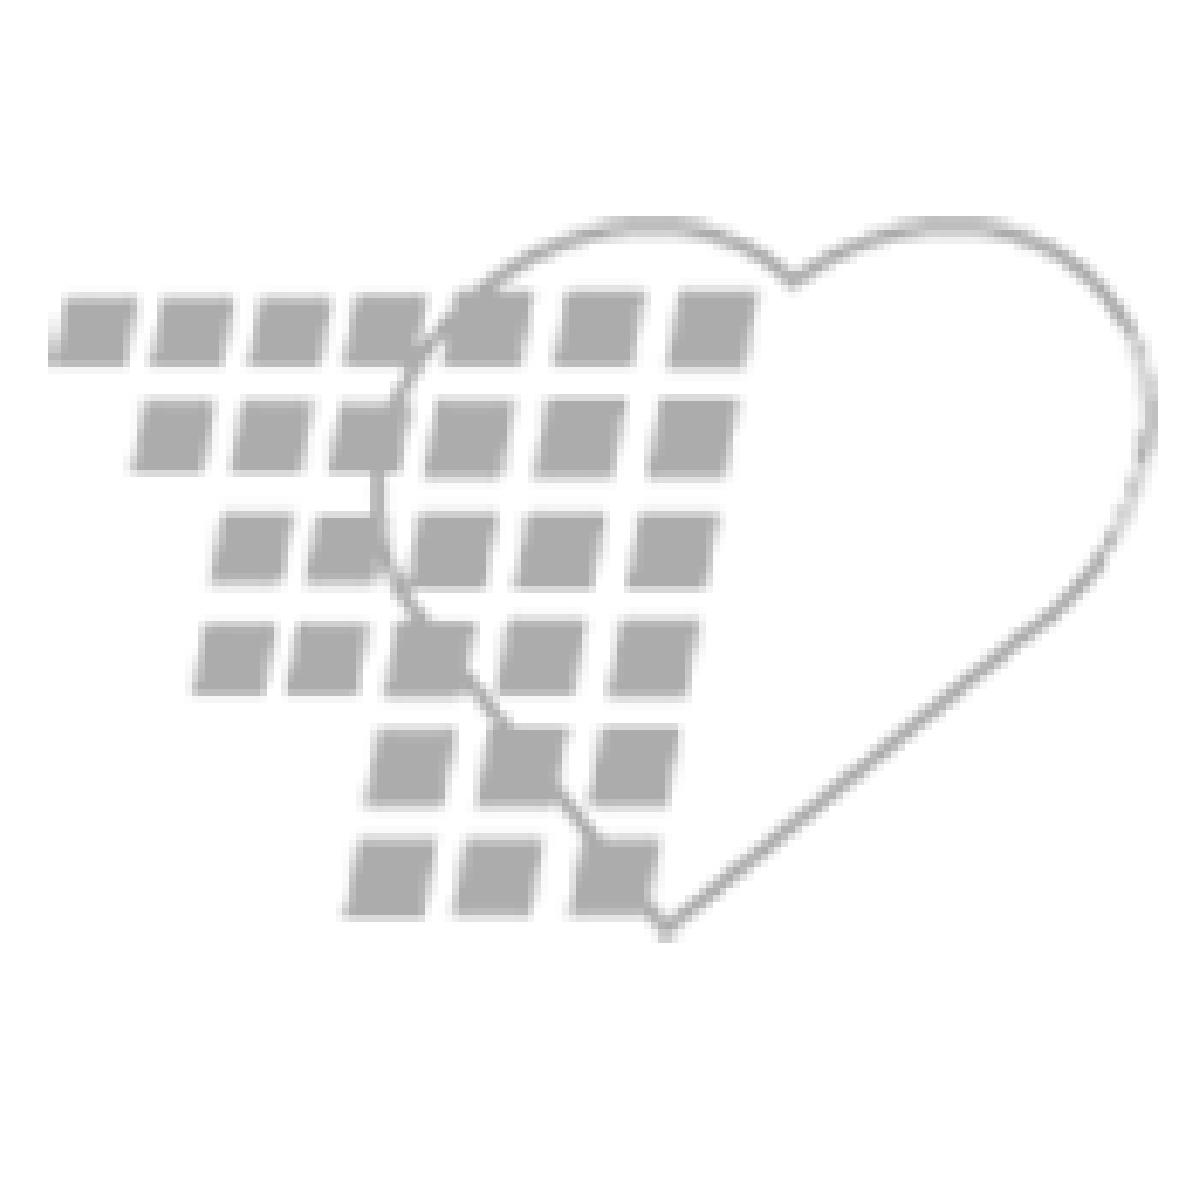 09-31-9766 Respiratory System Chart